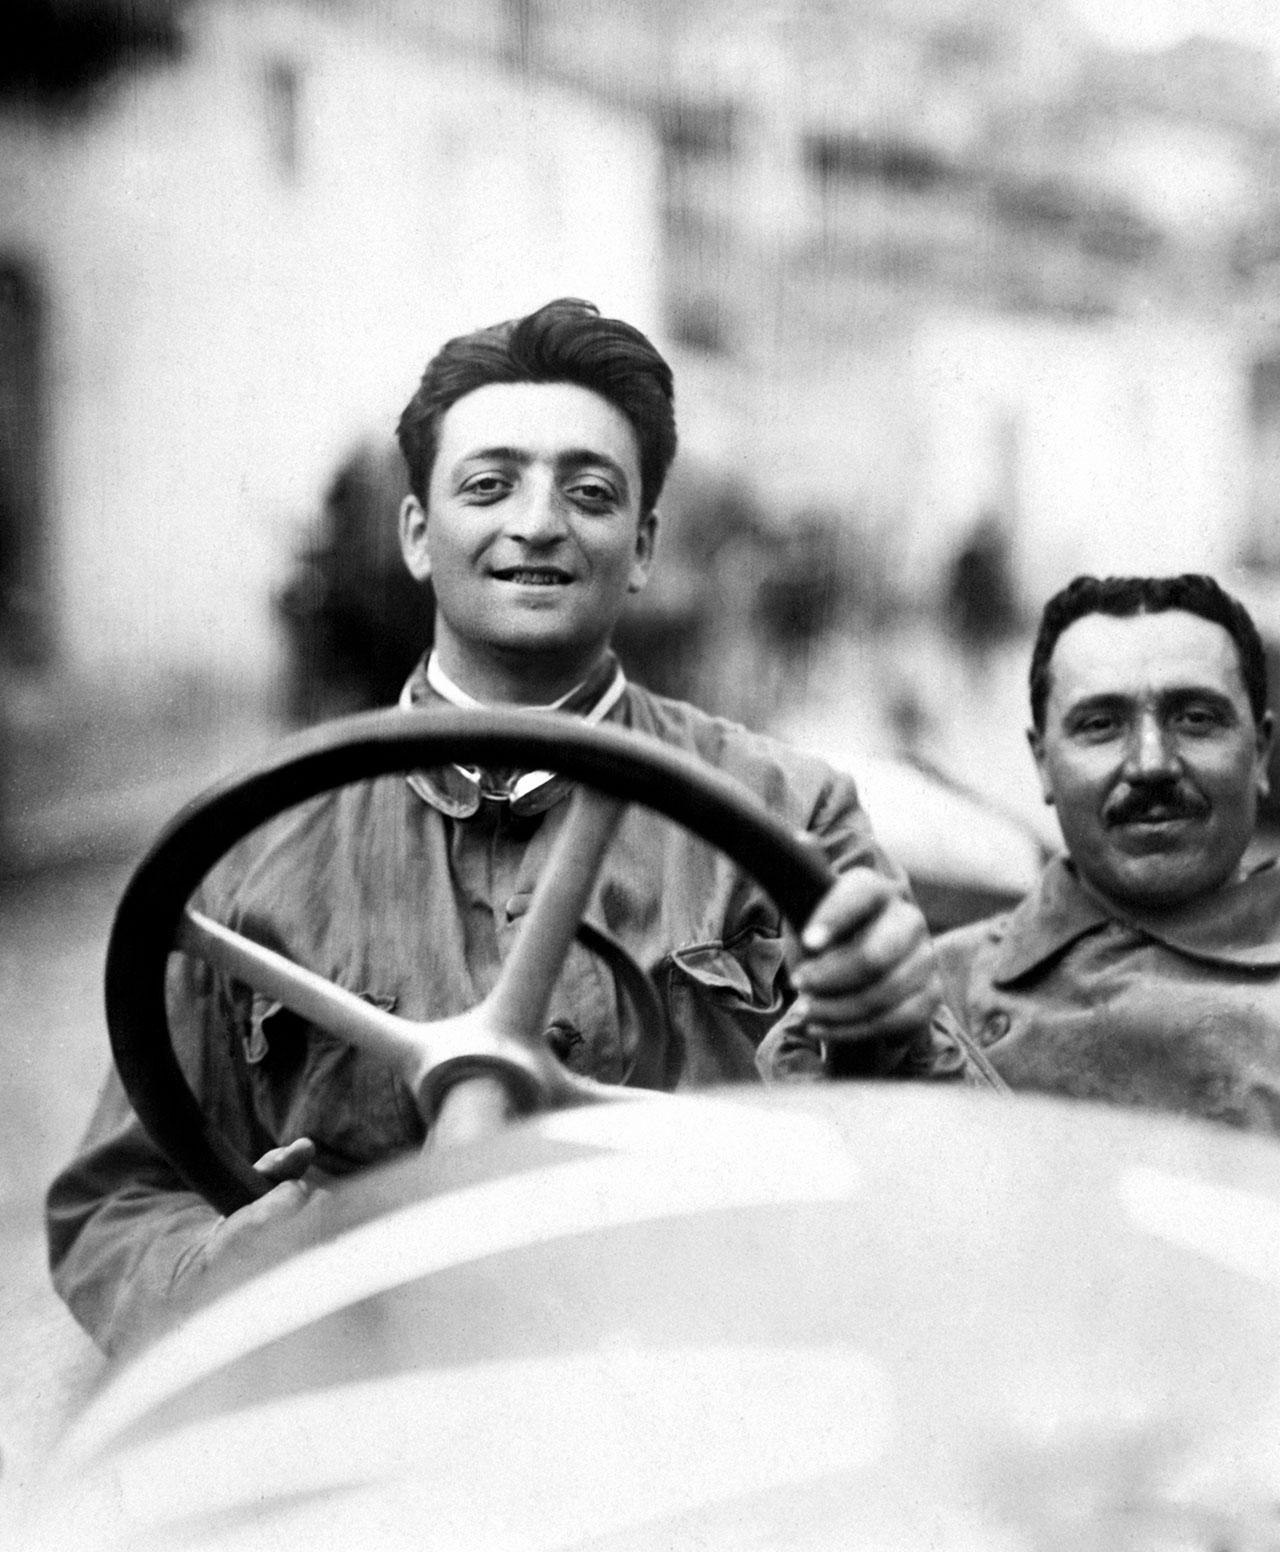 Enzo Ferrari at the Targa Florio in 1920. - The car is an Alfa Romeo 40-60 HP Racing Type. Photo courtesy of Ferrari.